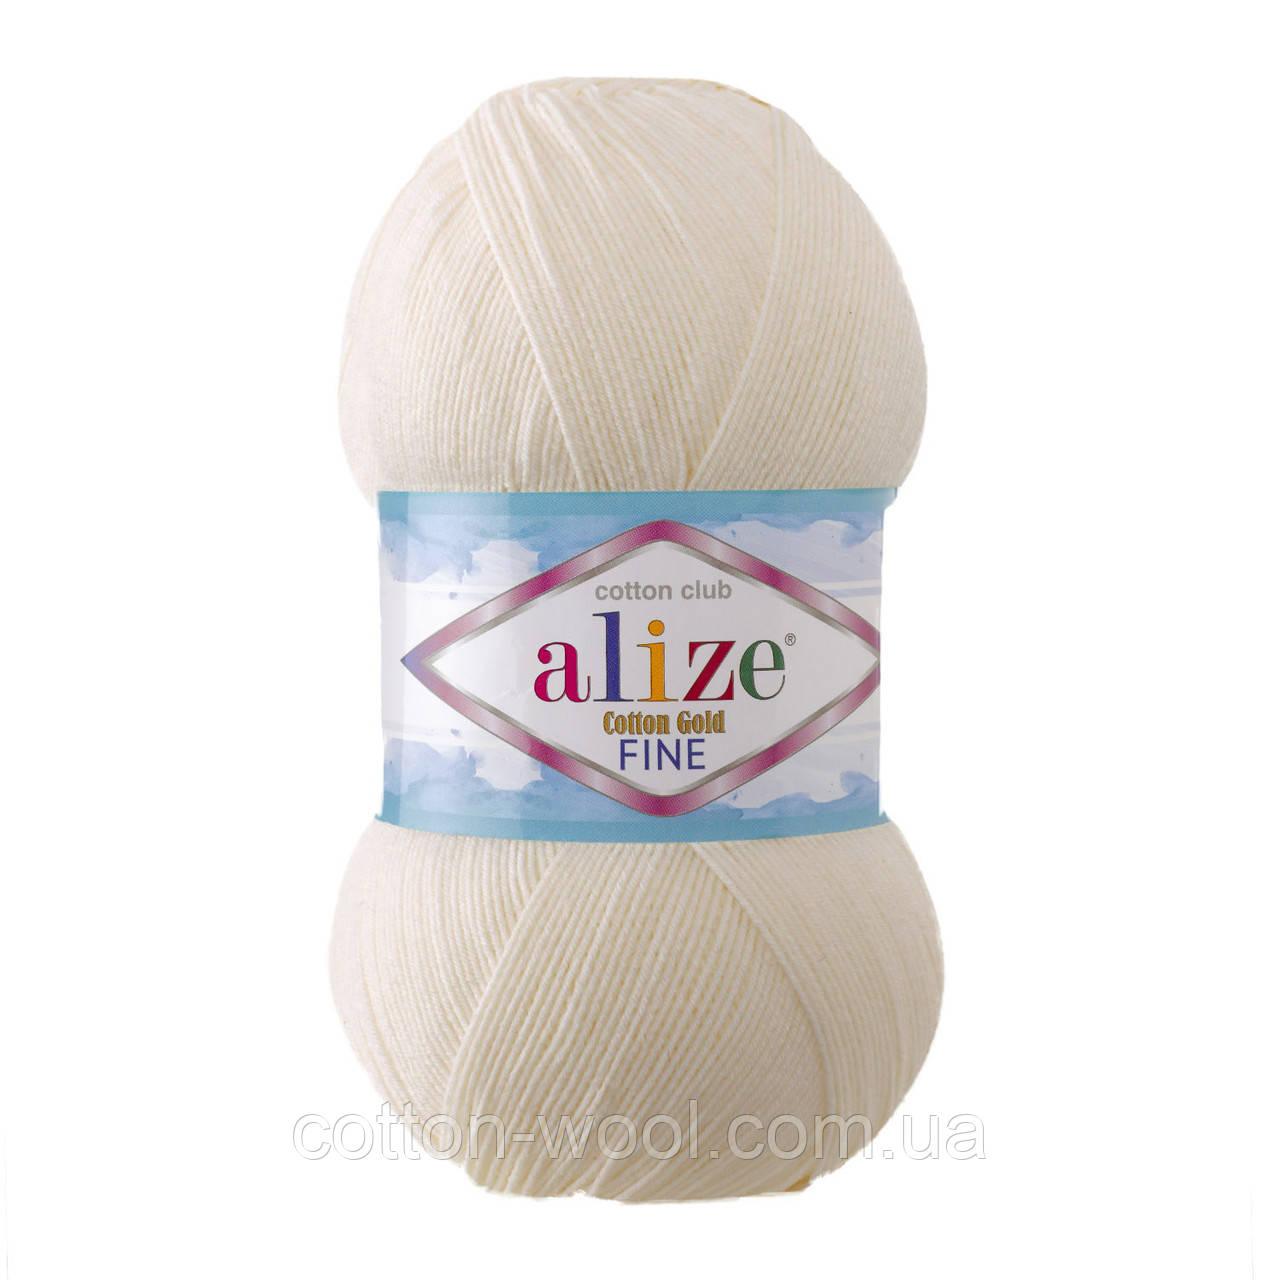 Alize Cotton  Gold Fine (Коттон Голд Файн) 55% - бавовна, 45% - акріл 62